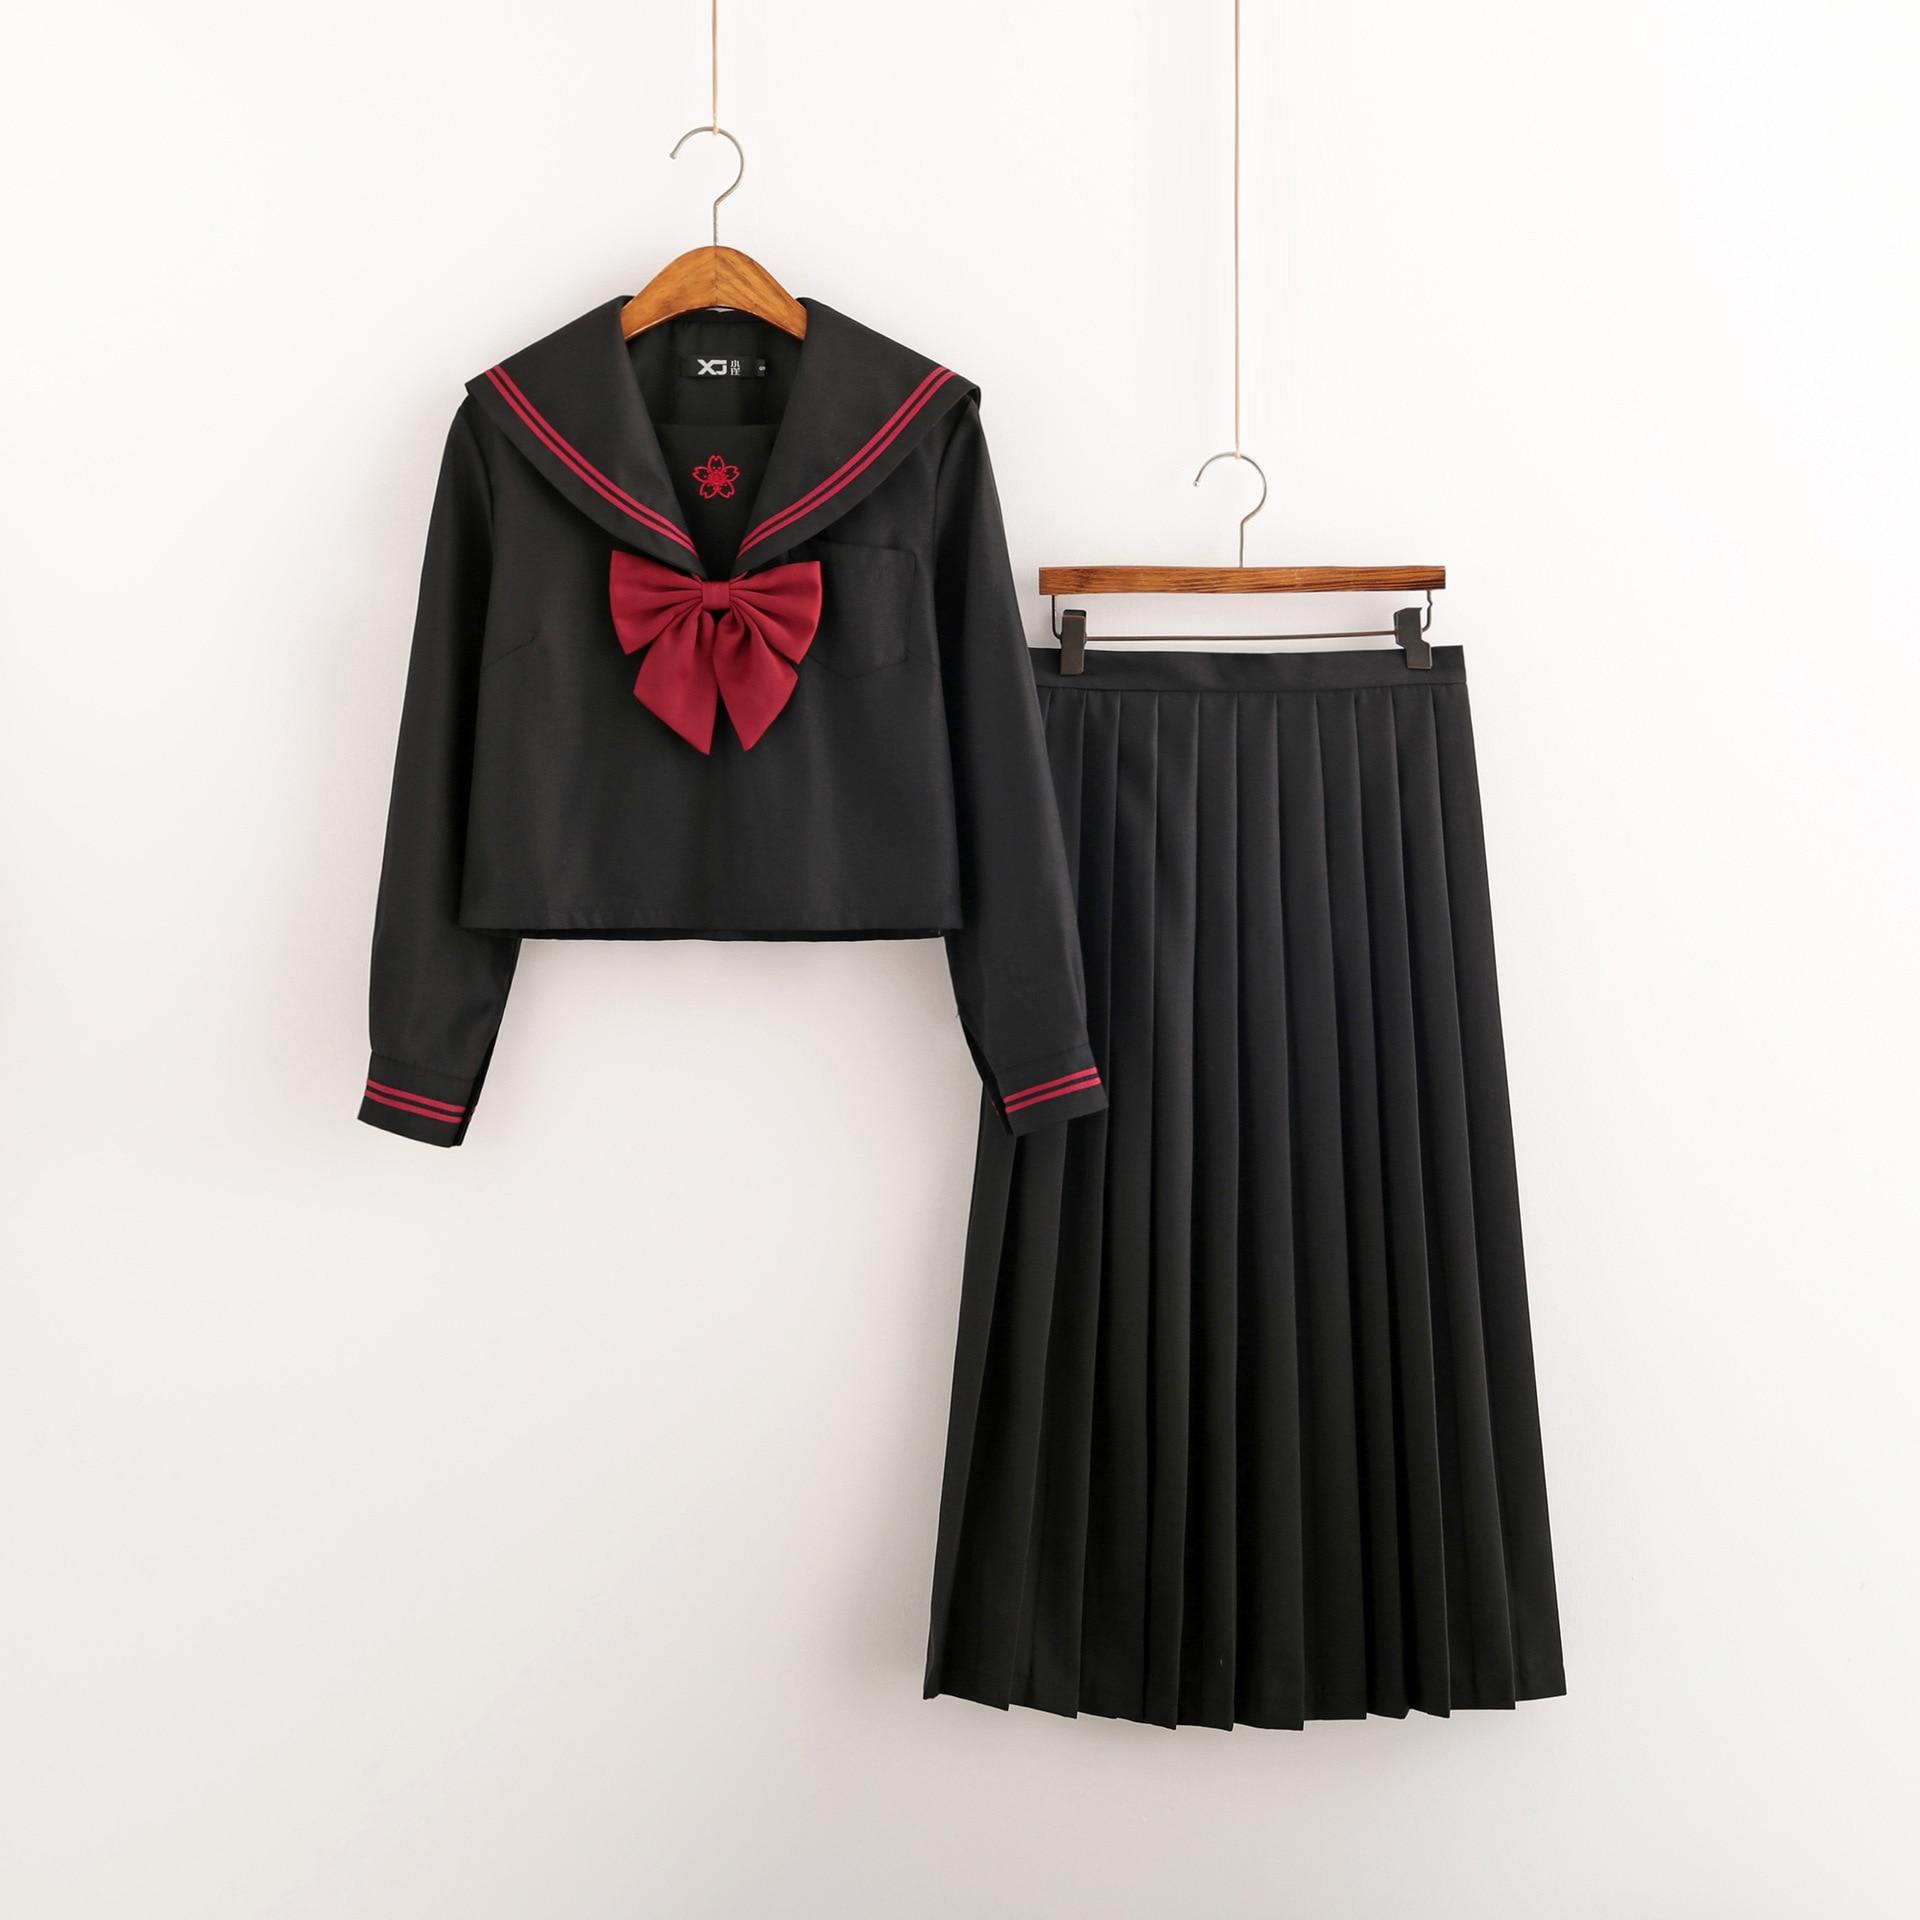 2019 Summer Japanese School Uniforms For Girls Black Tops Long Skirt Sailor Pleated Skirt Full Sets Cosplay Jk Costume Series XL